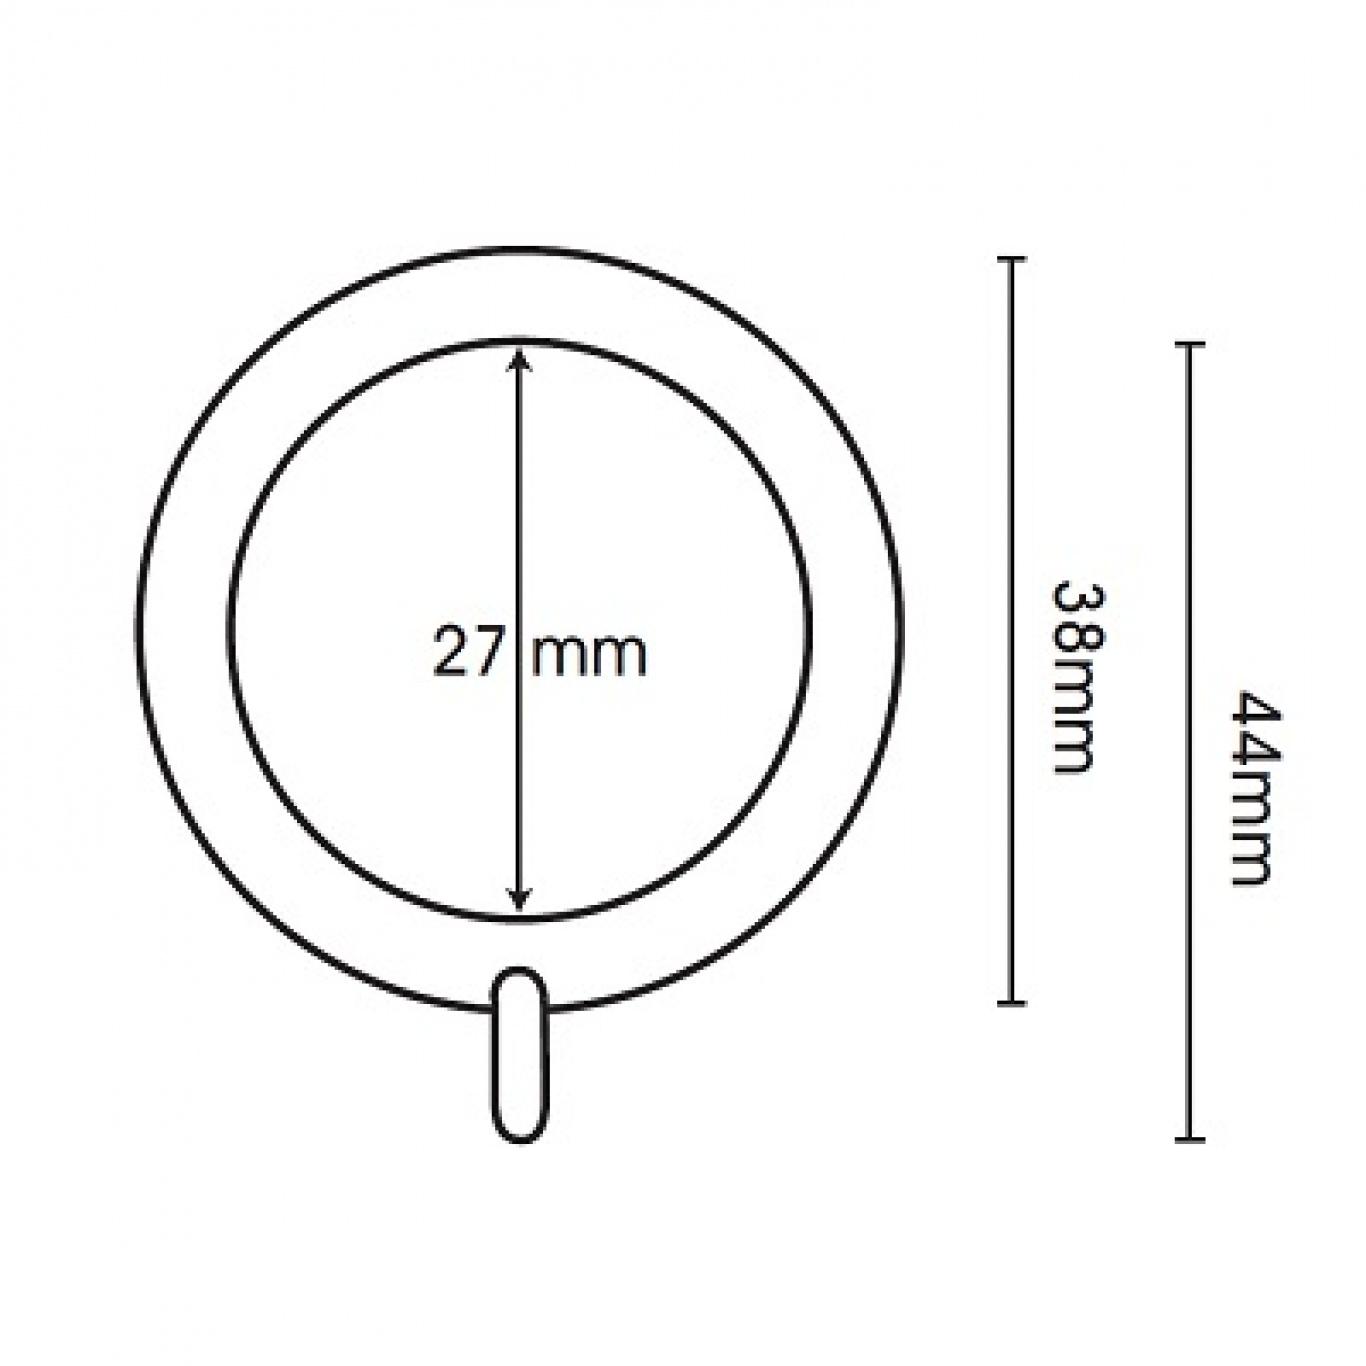 Swish Belgravia 19mm Graphite Metal Pole